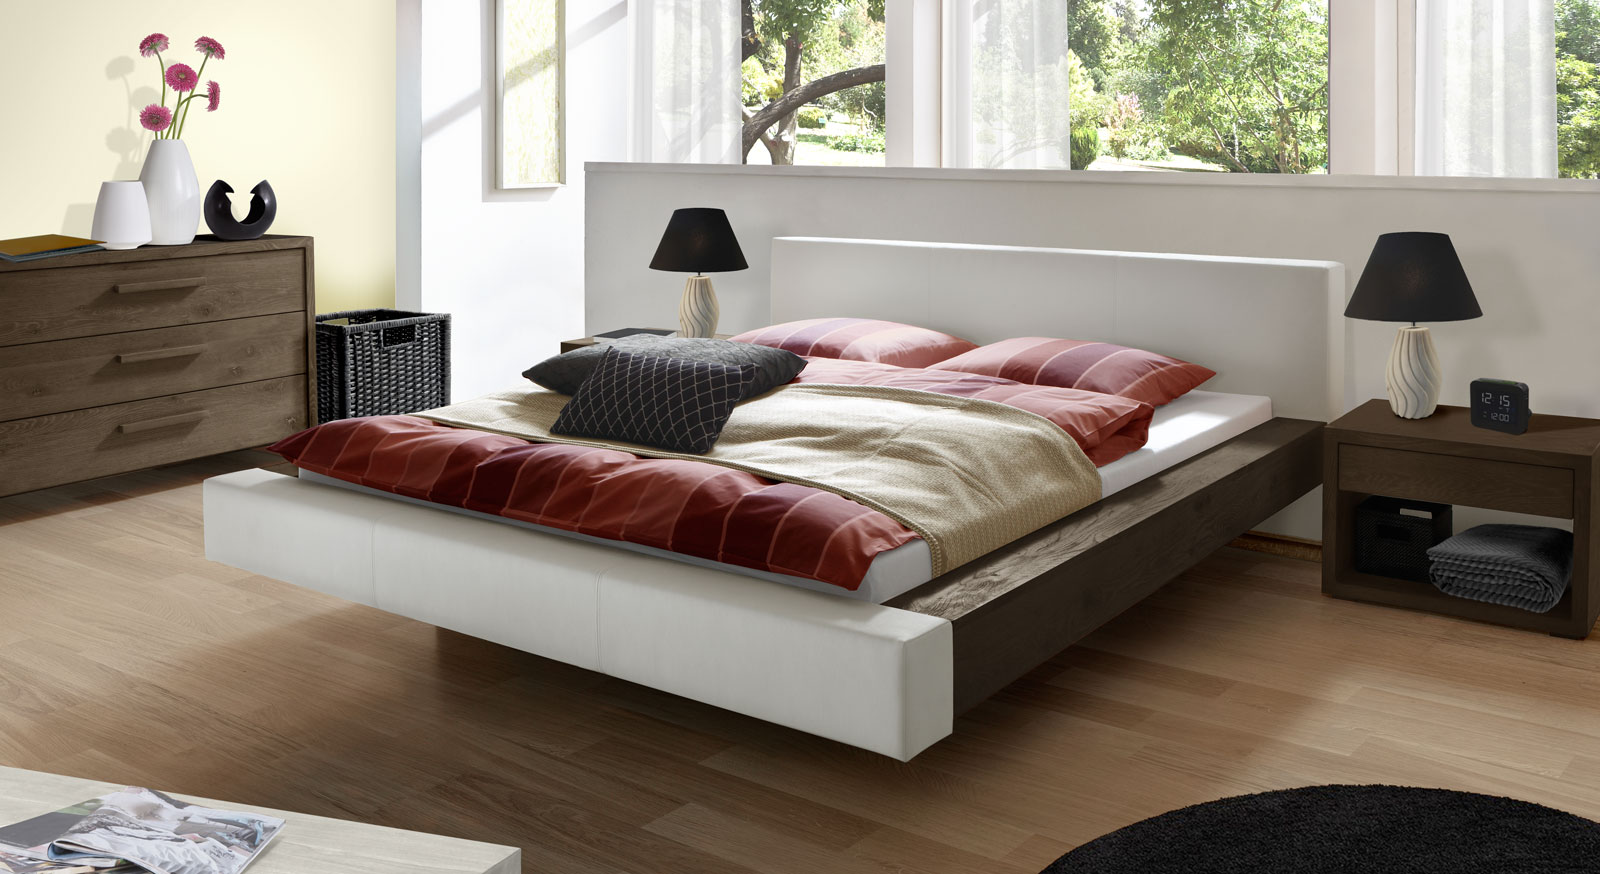 bett schwebend mit echtleder und massivholz vilar. Black Bedroom Furniture Sets. Home Design Ideas